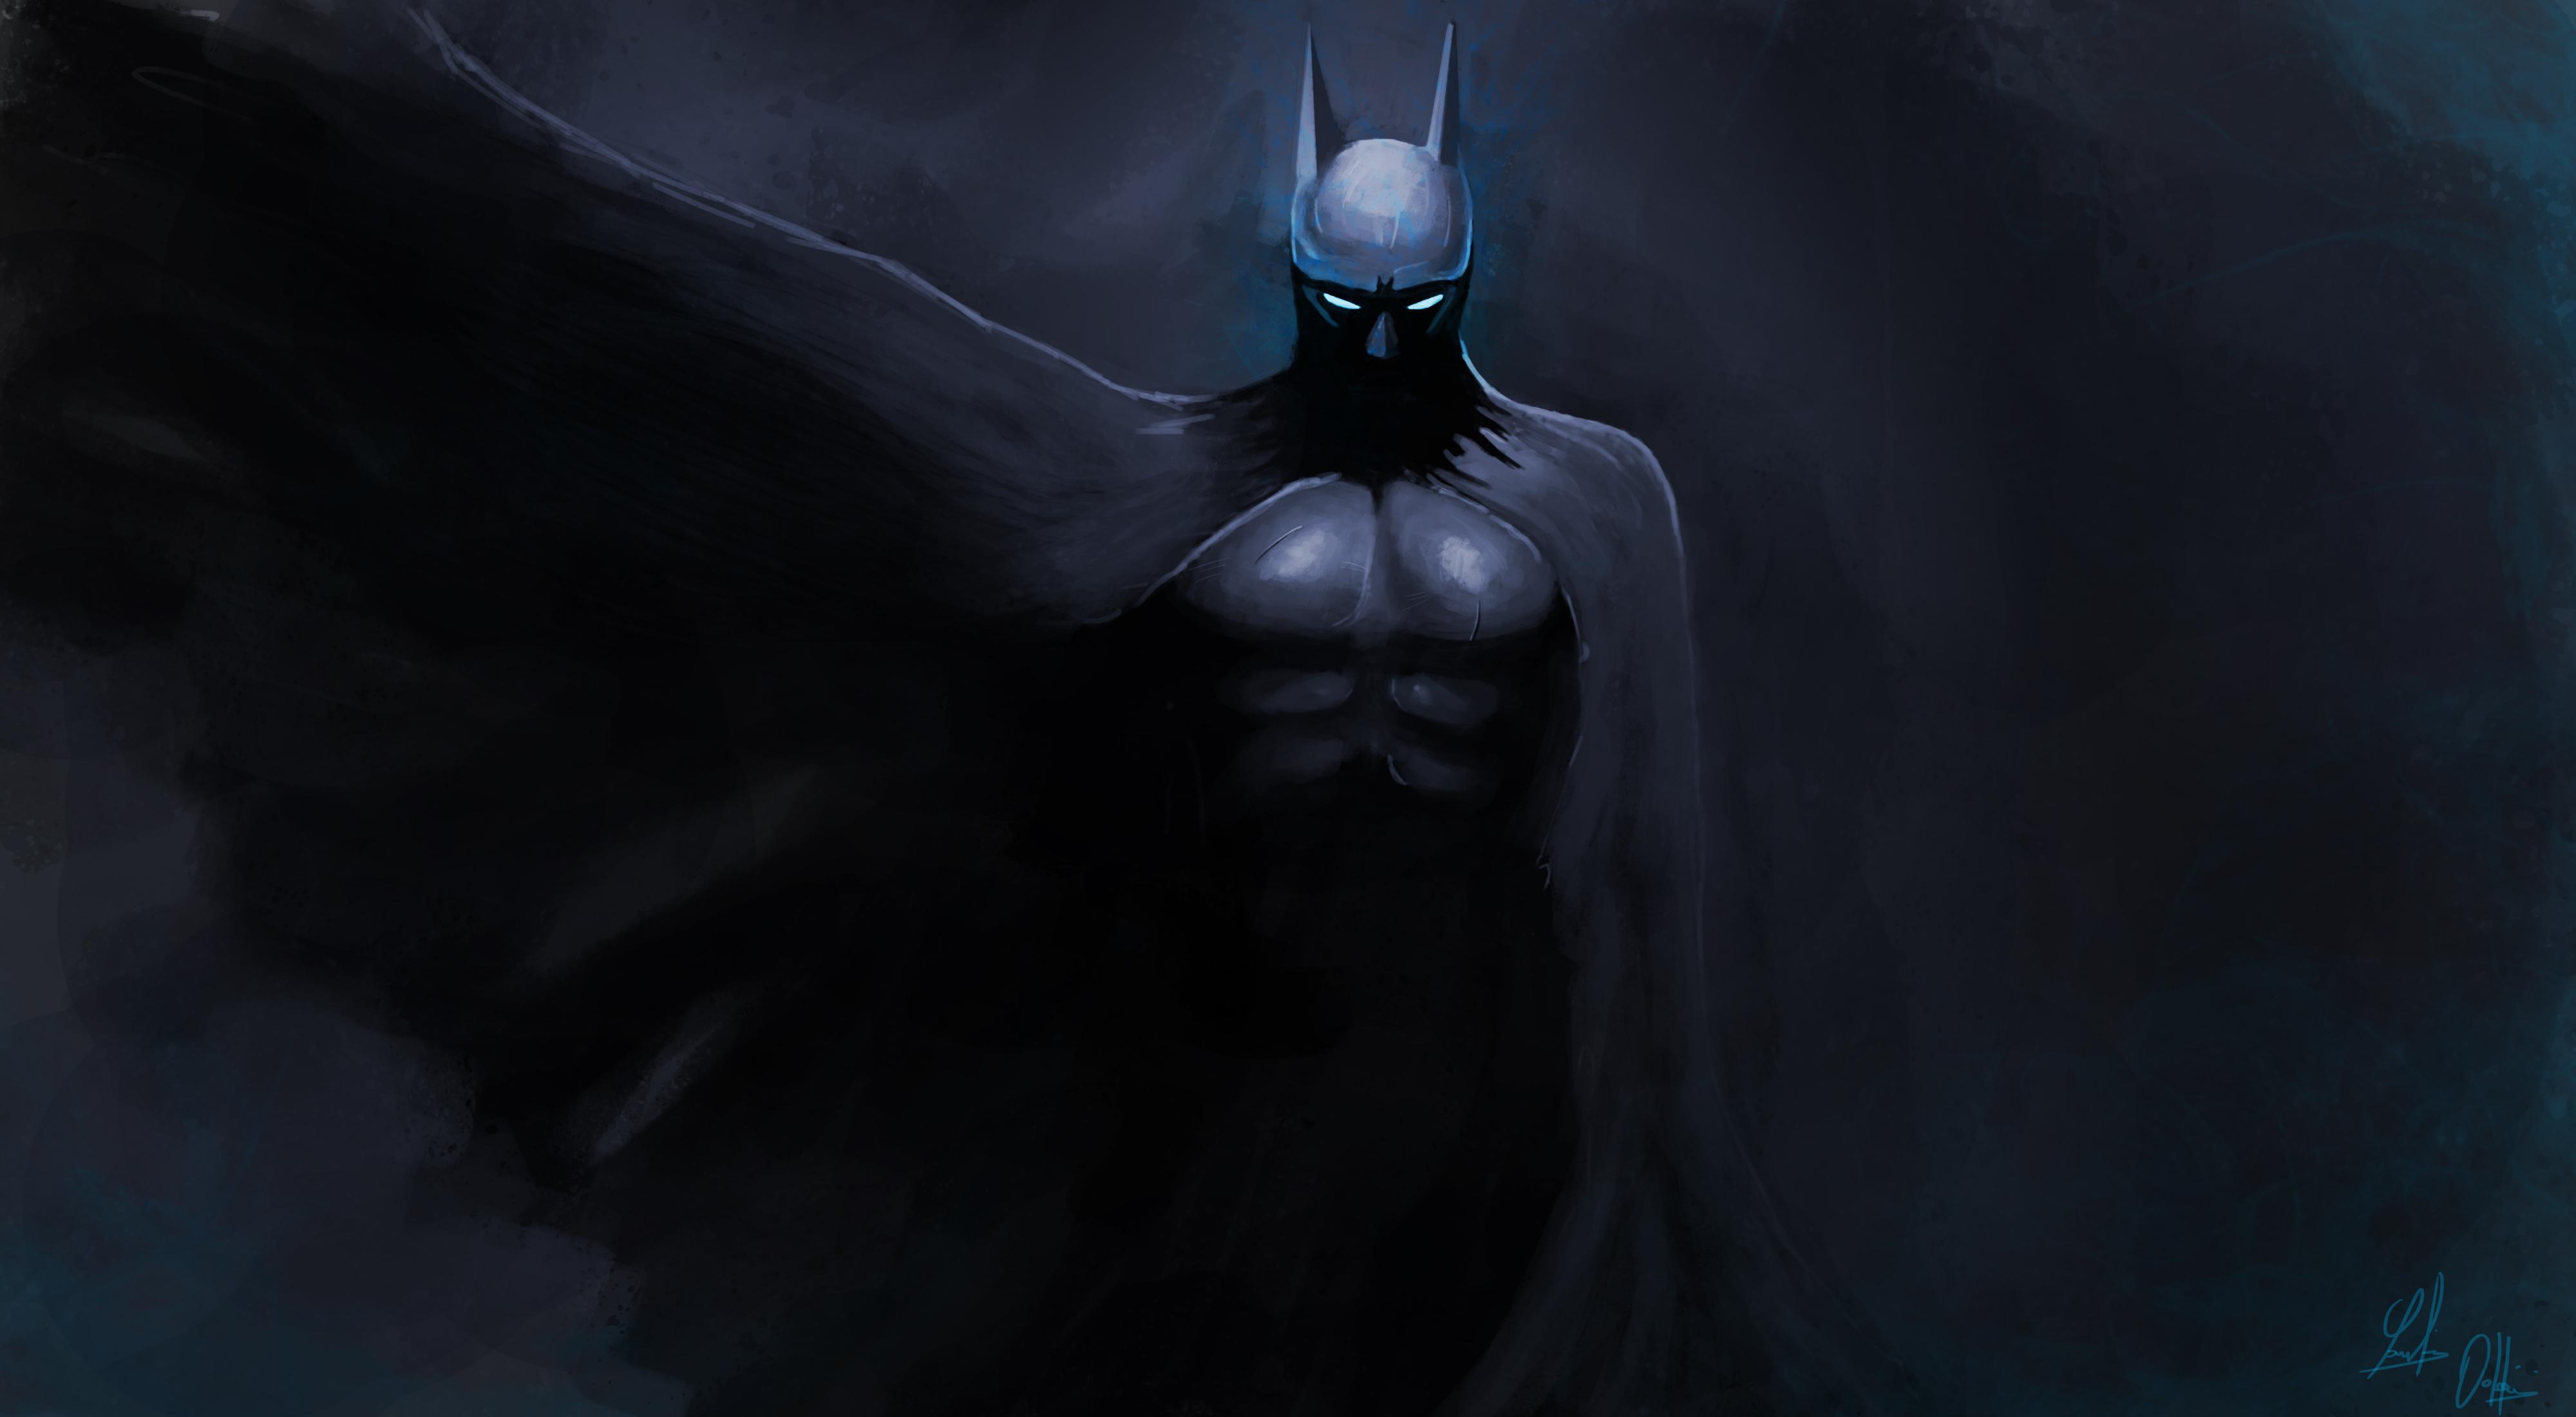 1024x1024 batman dark - photo #15